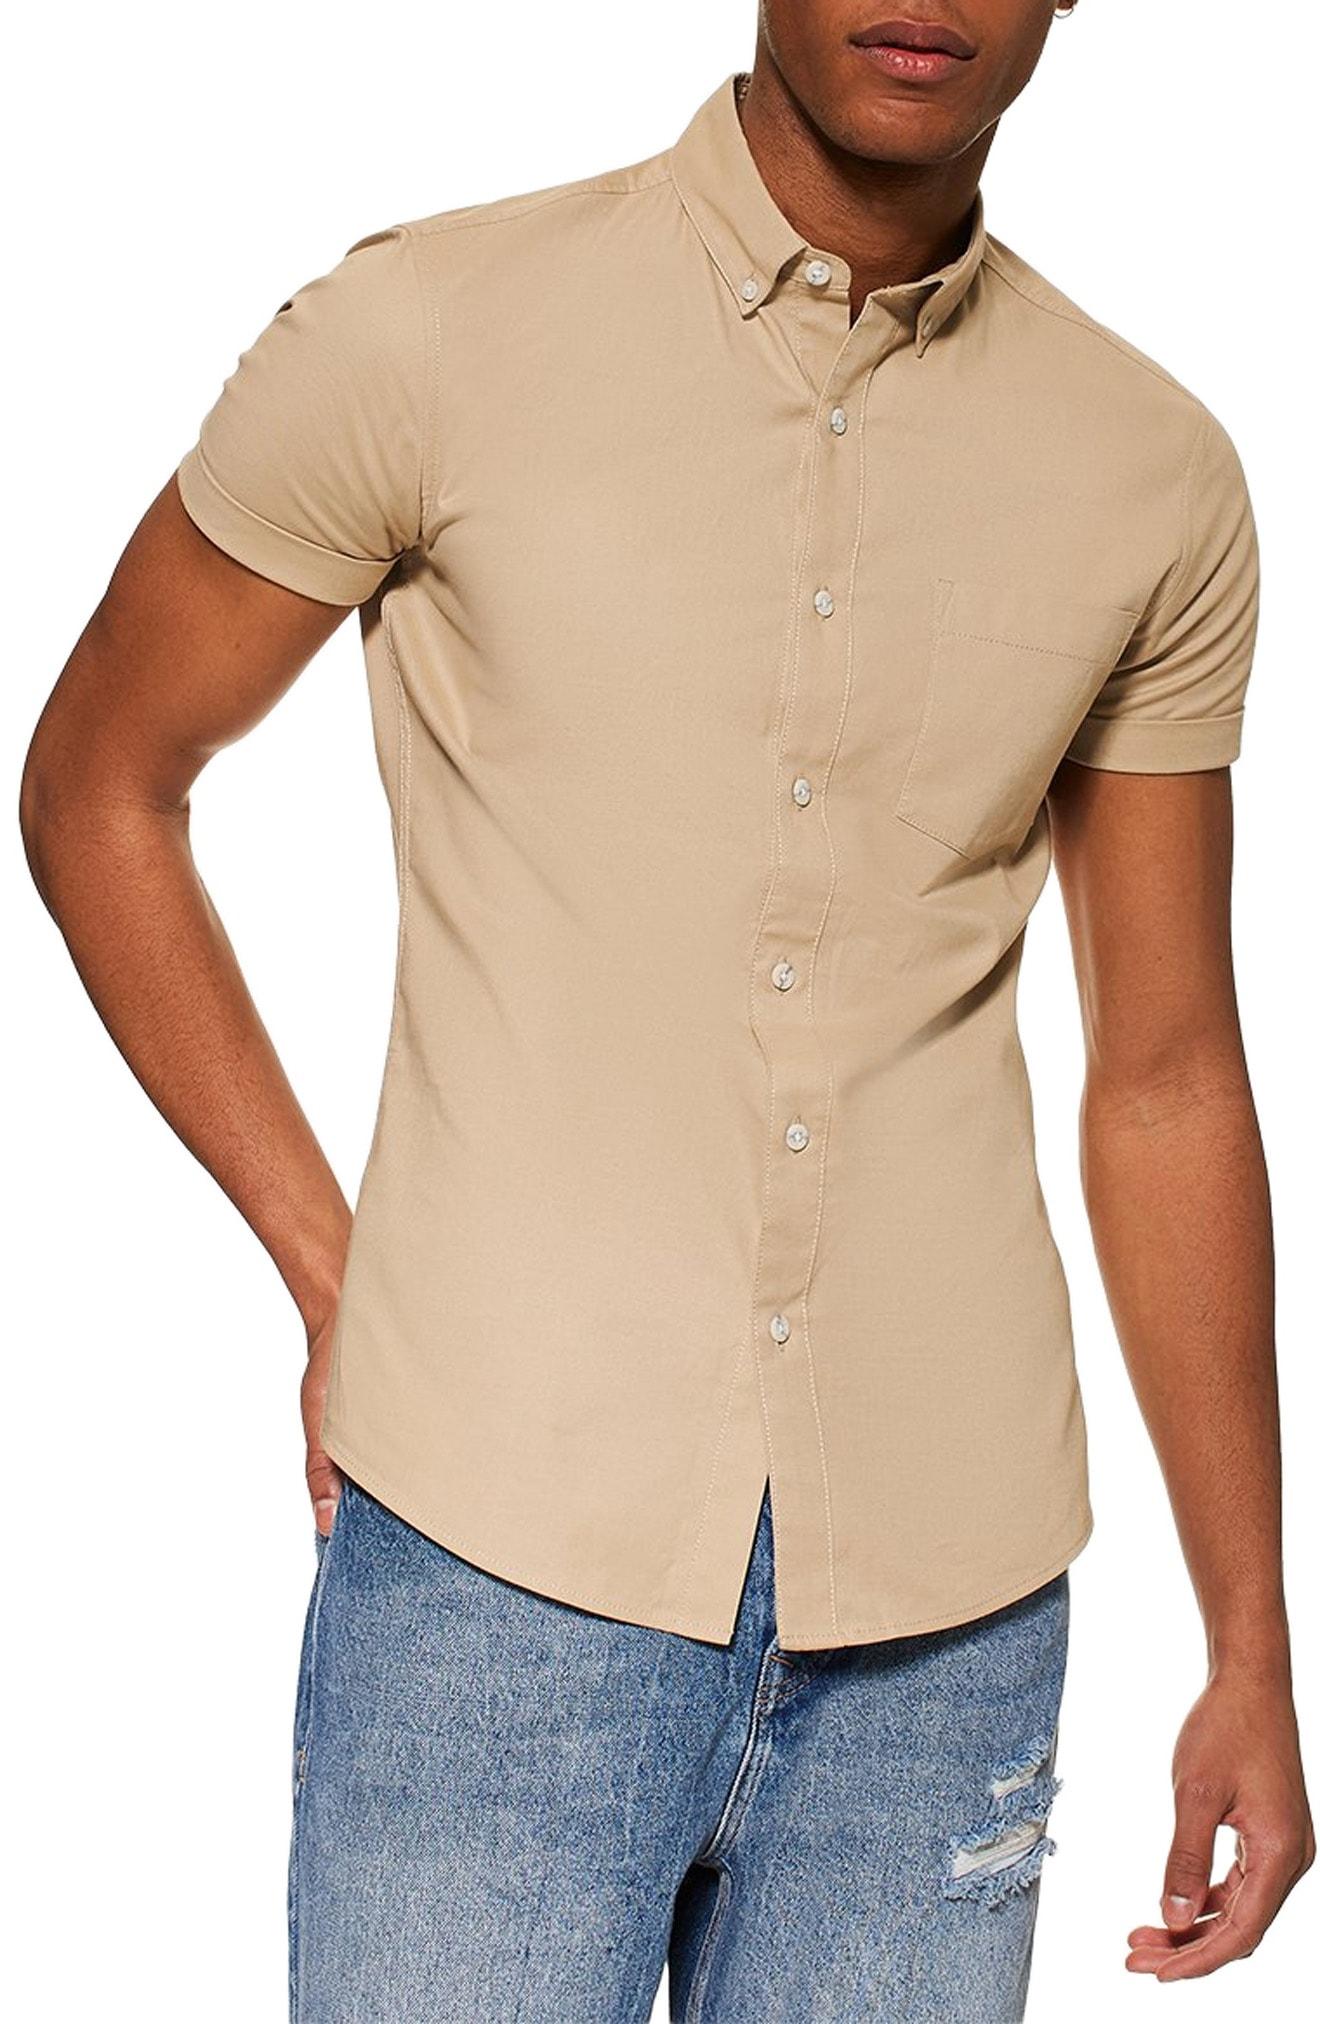 Men's Short Sleeve Shirts | Nordstrom